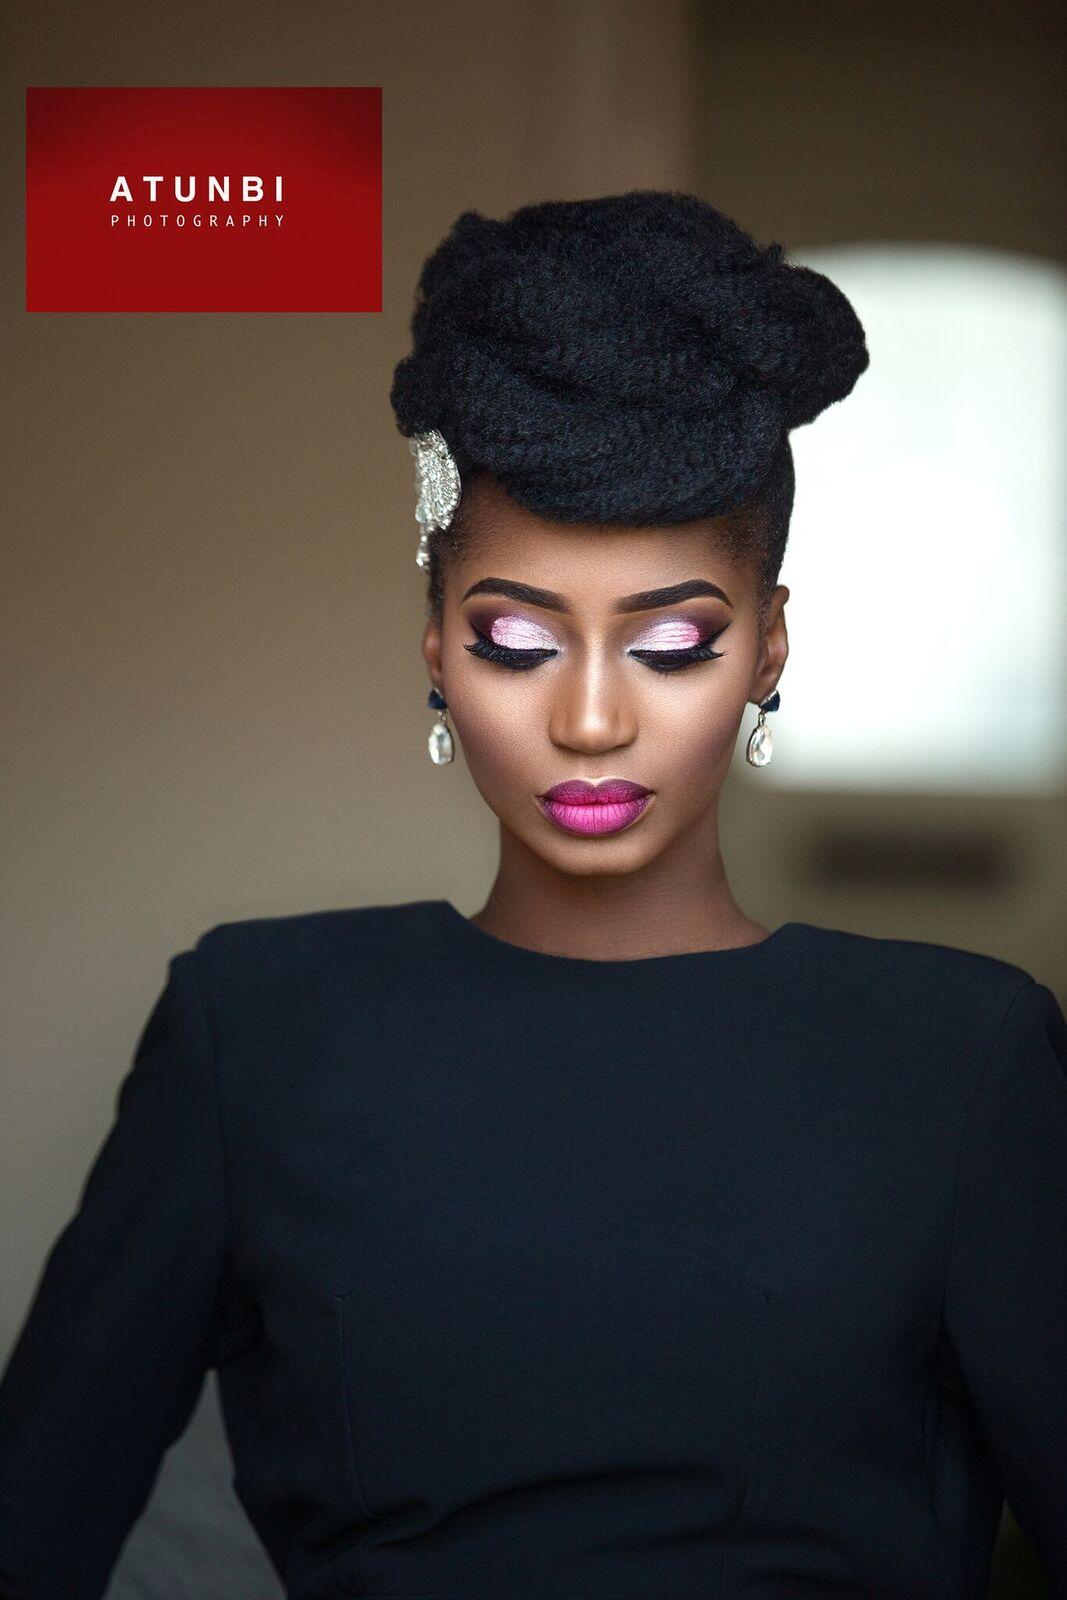 Bn Bridal Beauty Parispurple X Atunbi X Charis Hair S